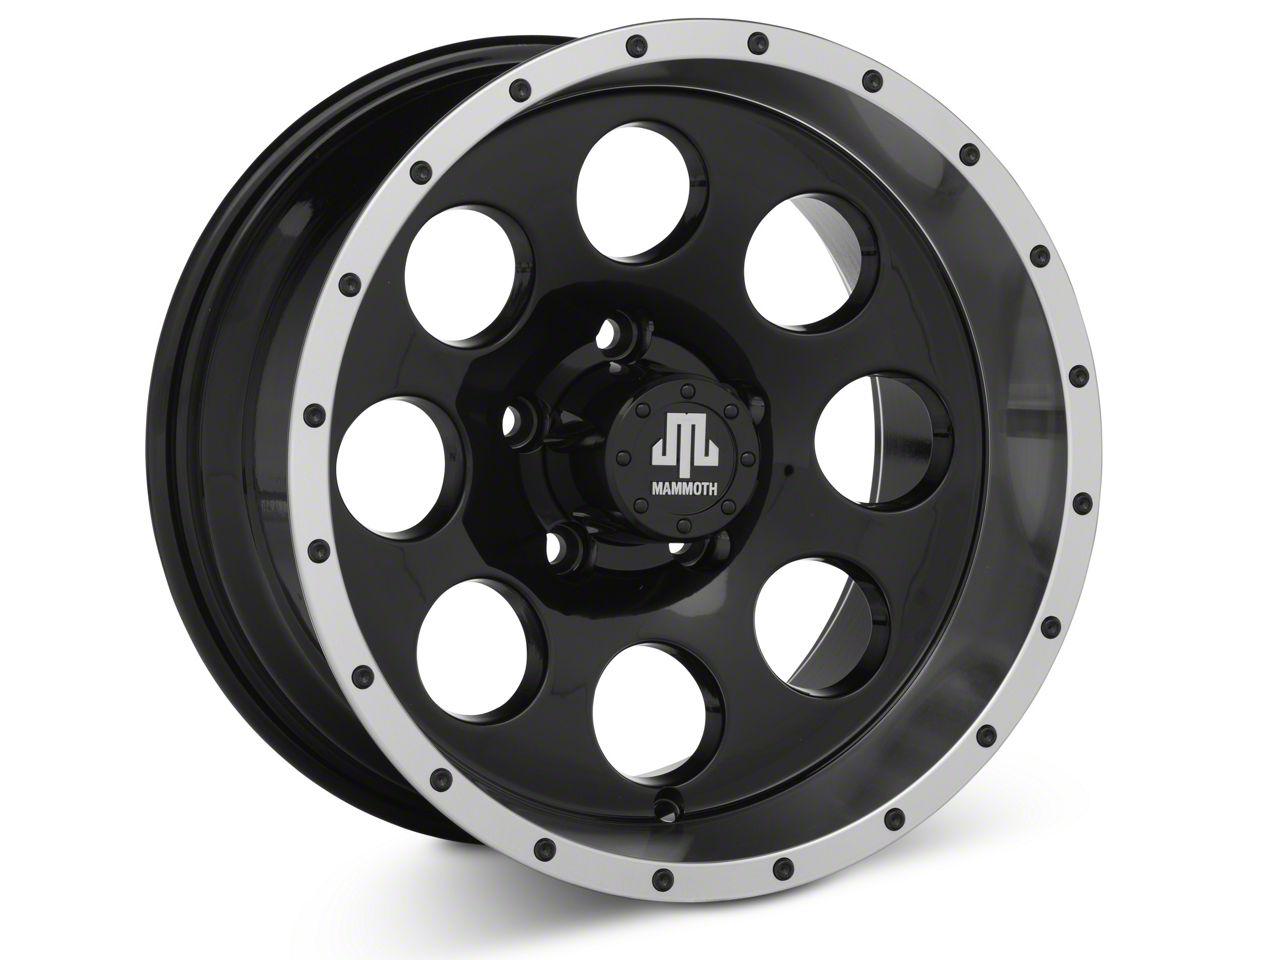 Mammoth 8 Beadlock Style Black 15x8 Wheel & Mickey Thompson Baja MTZP3 31x10.50R15 Tire Kit (87-06 Jeep Wrangler YJ & TJ)